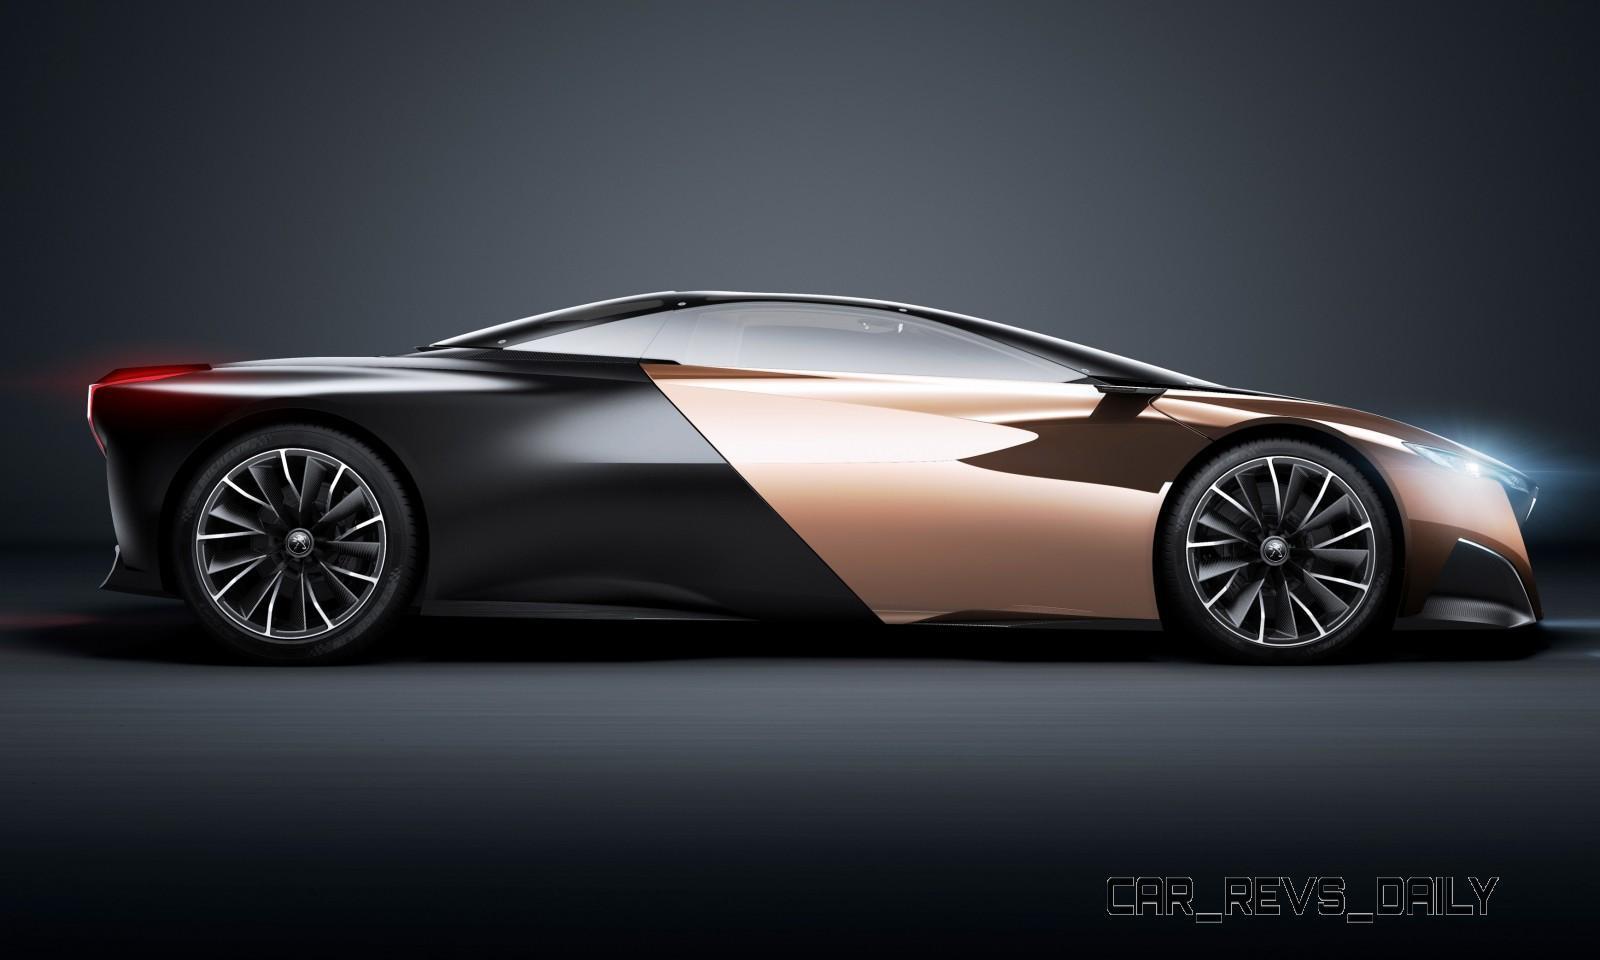 Concept Flashback - 2012 Peugeot ONYX Is Mixed-Media Hypercar Delight 25